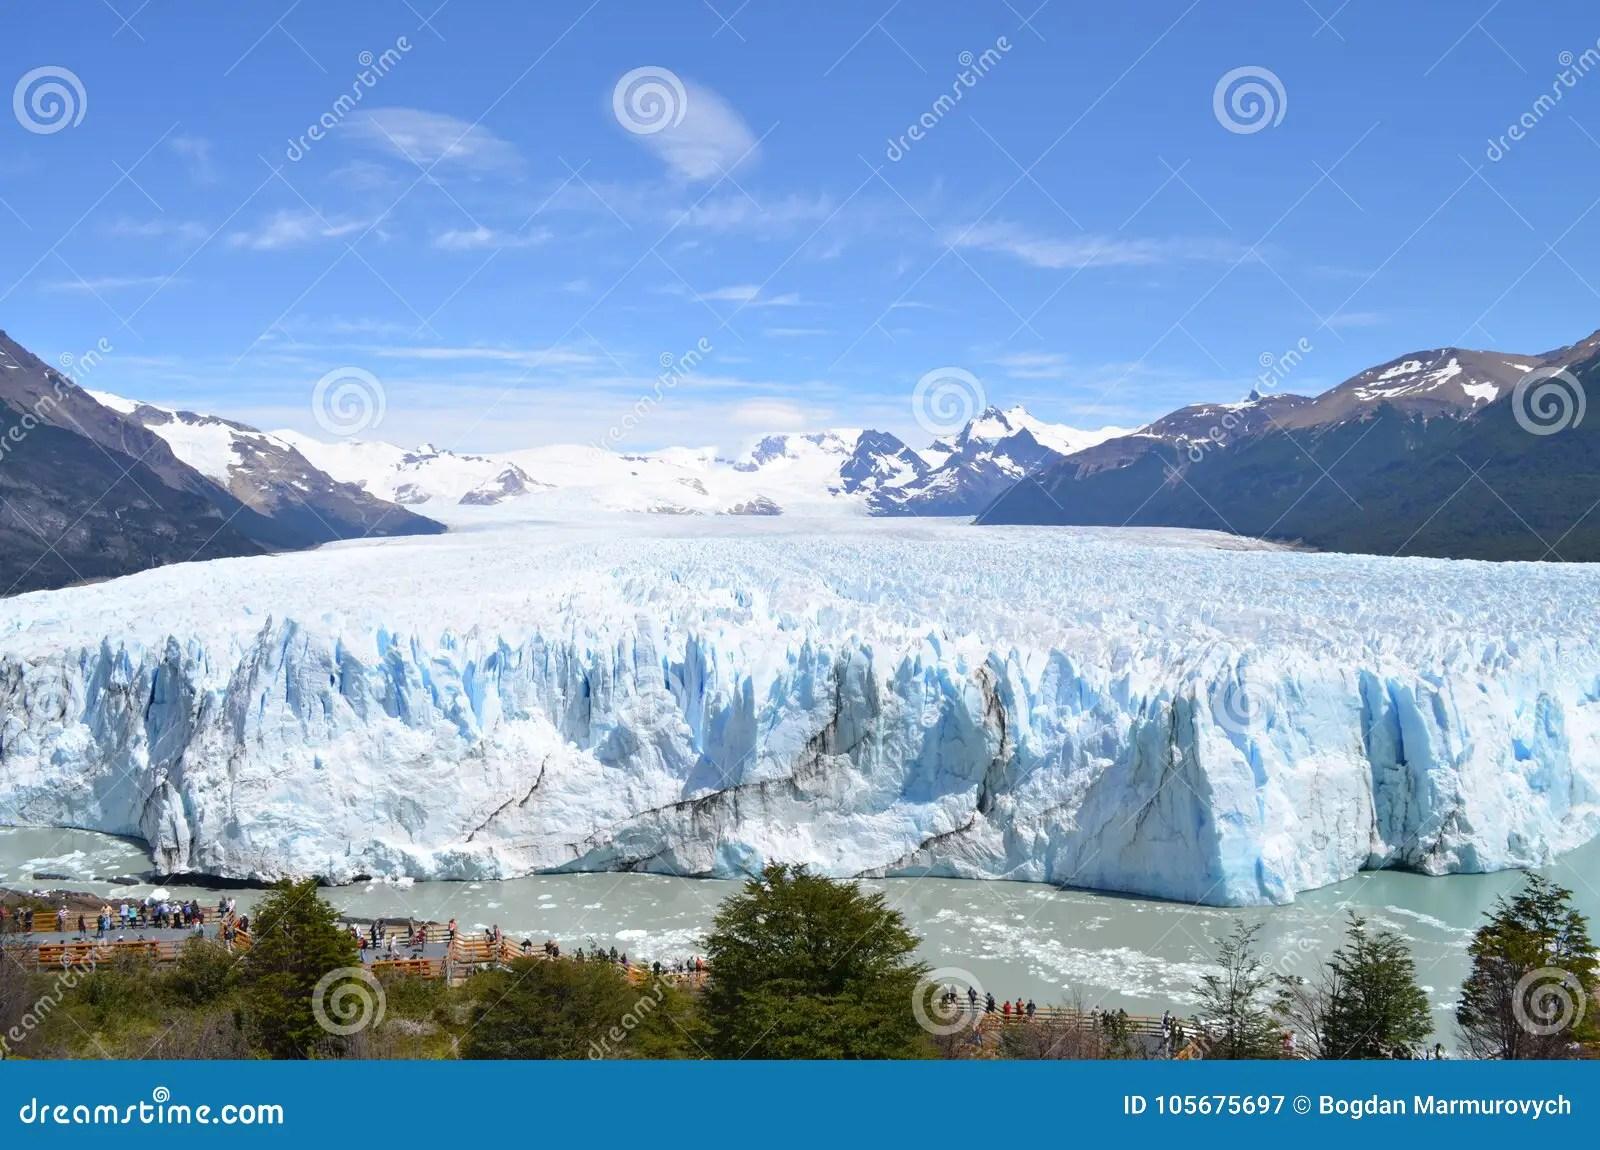 iceberg from parc national los glaciares in argentina near el calafate